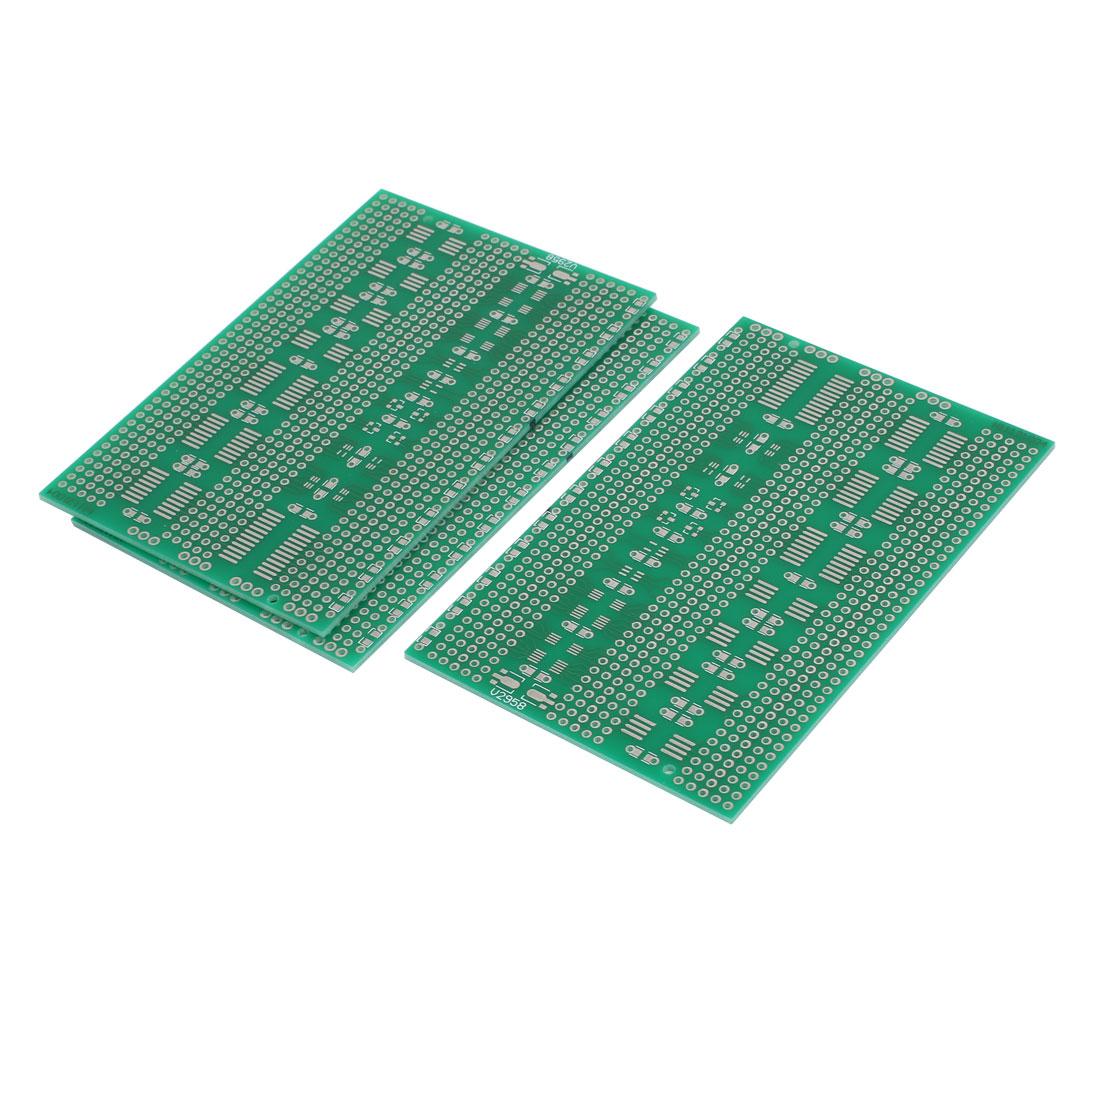 3Pcs 7cm x 11cm Single Sided Paper Tinned Universal PCB Print Circuit Board